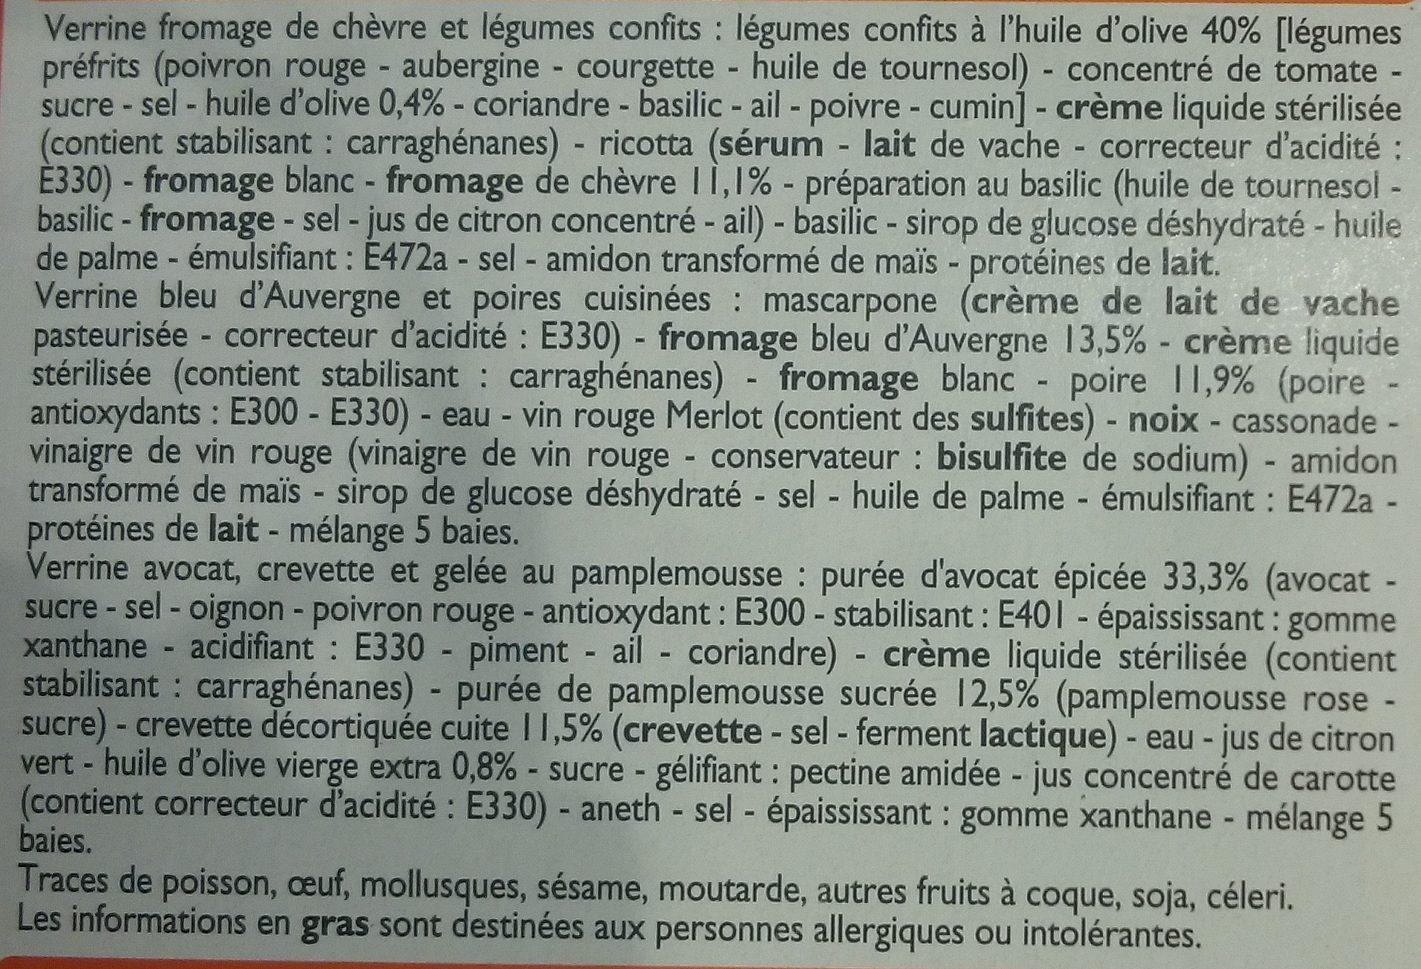 Verrines Salées Apéritives - Ingrediënten - fr